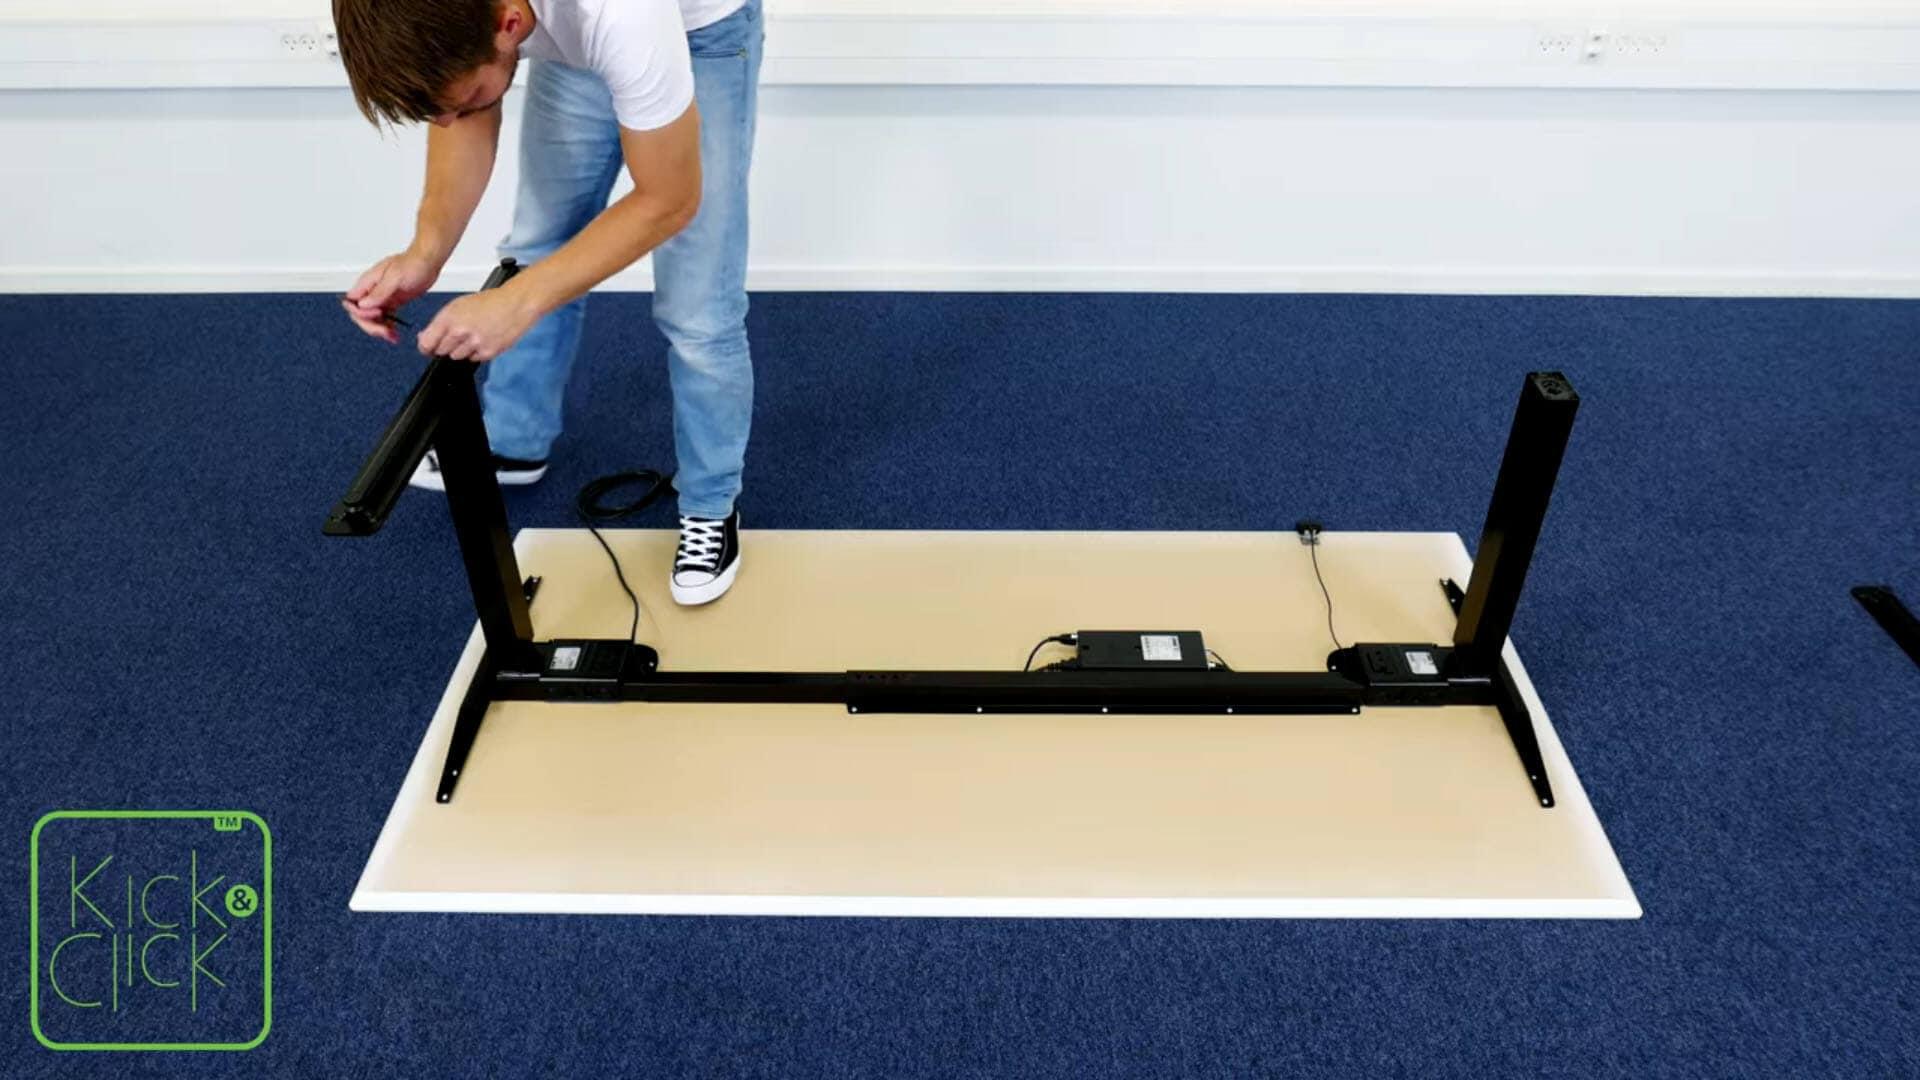 LINAK Kick & Click 방식의 사무실 책상 조립을 쉽게 분해하는 방법